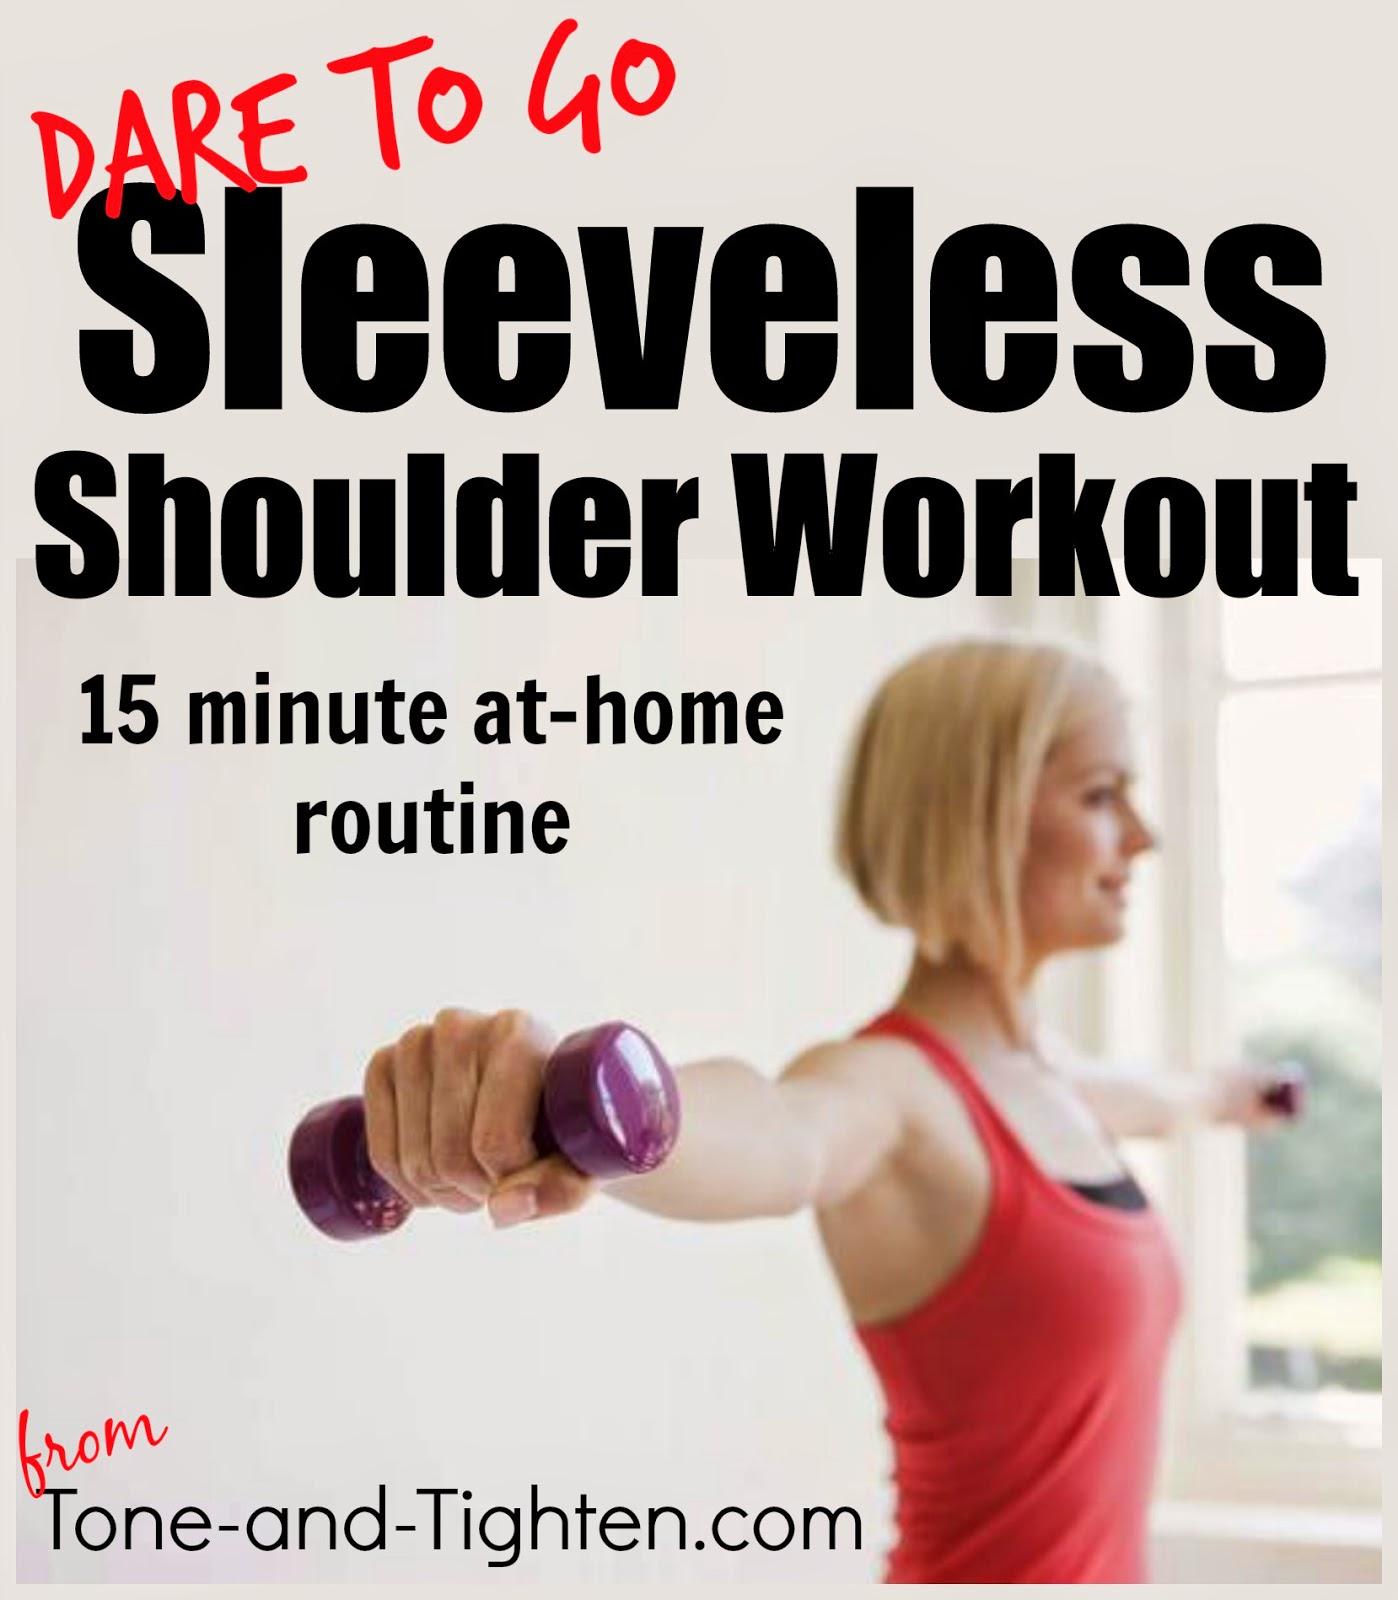 30 Best Gym Gloves Australia Images On Pinterest: Sleeveless Shoulder Workout